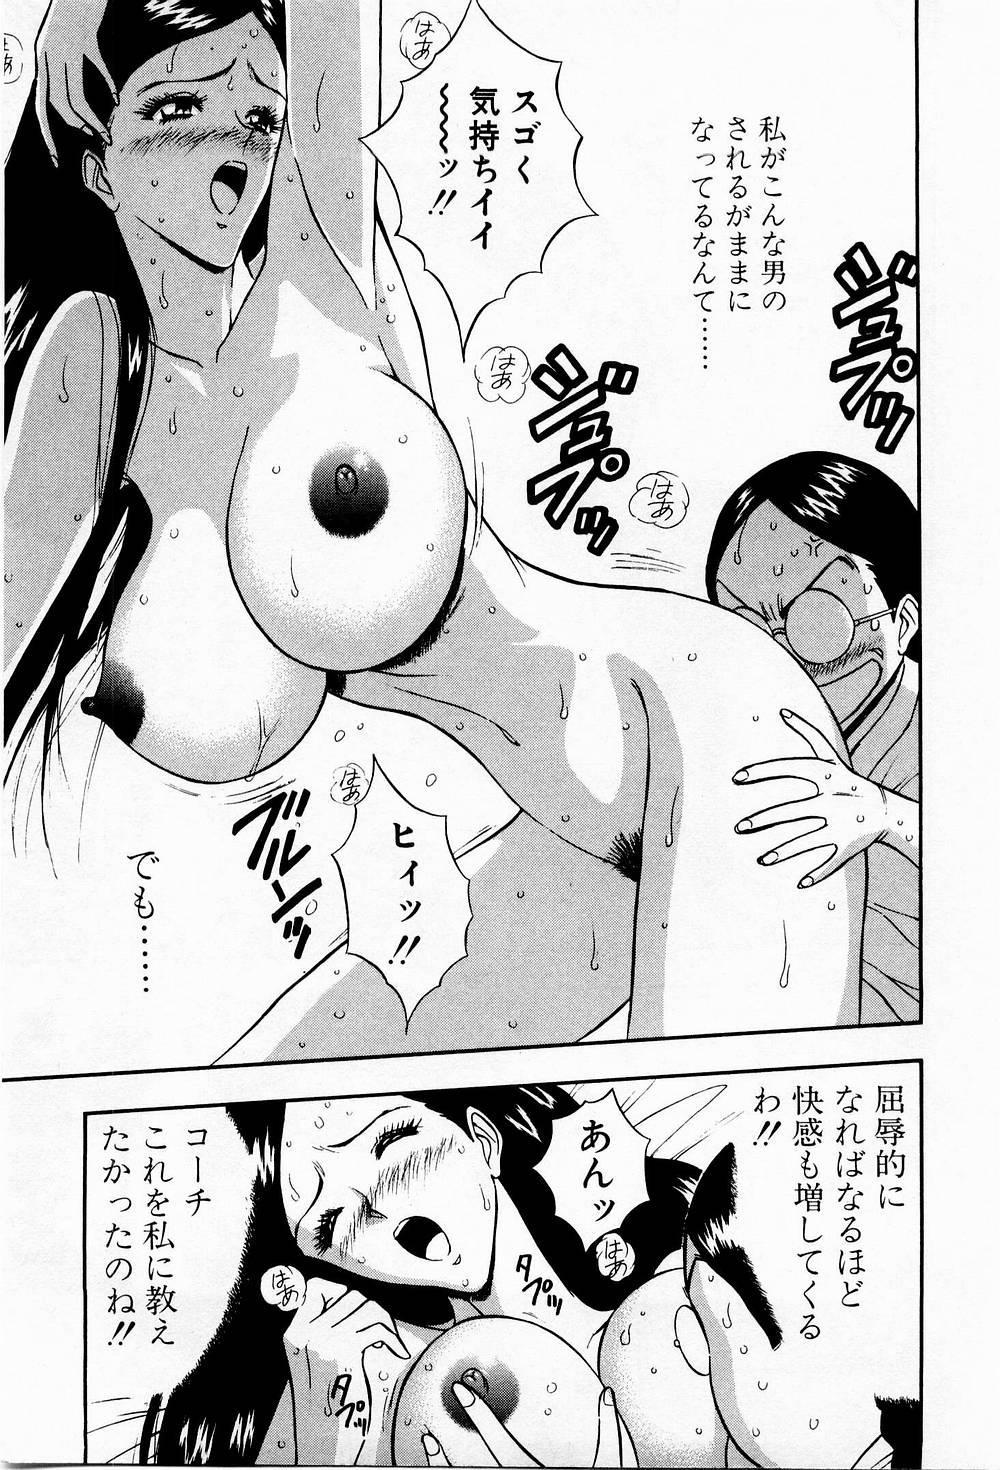 Bakusha Kyuudou Men 3 142